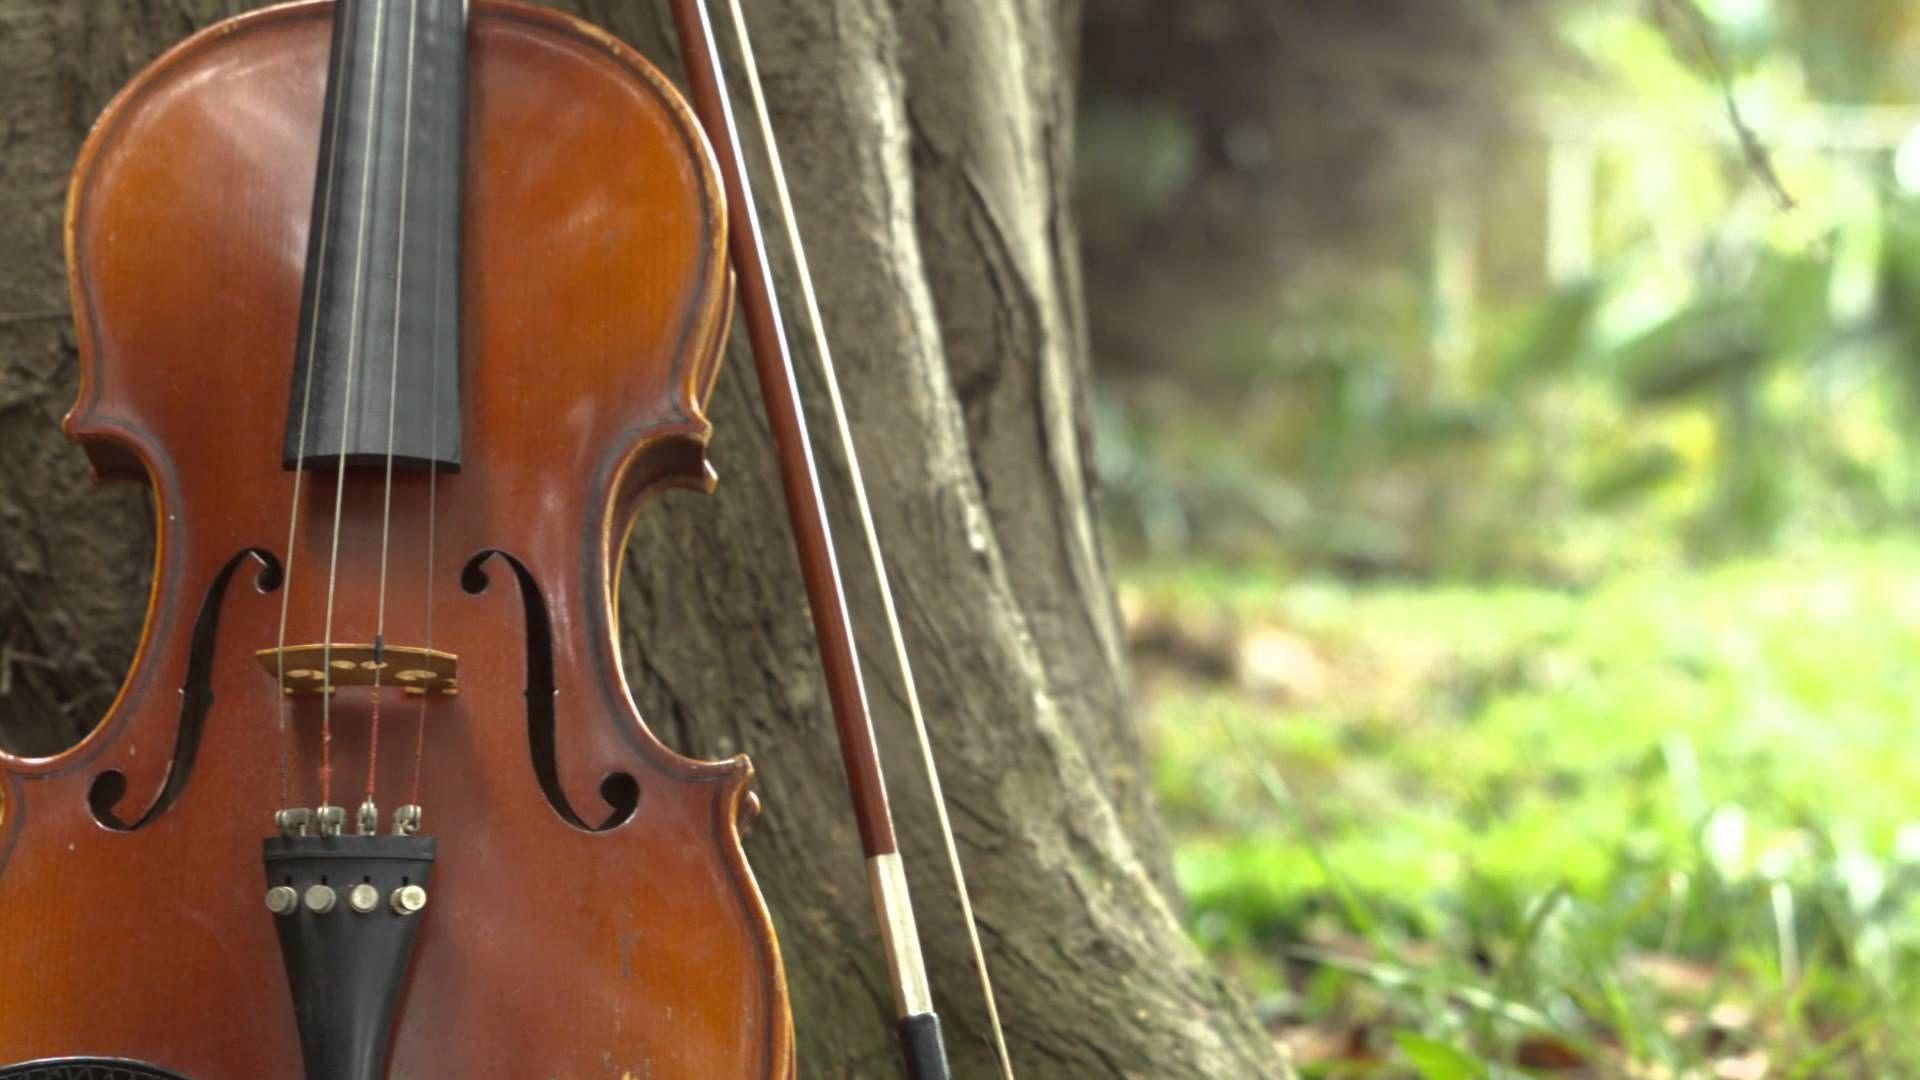 Violines Vallenatos - Esa